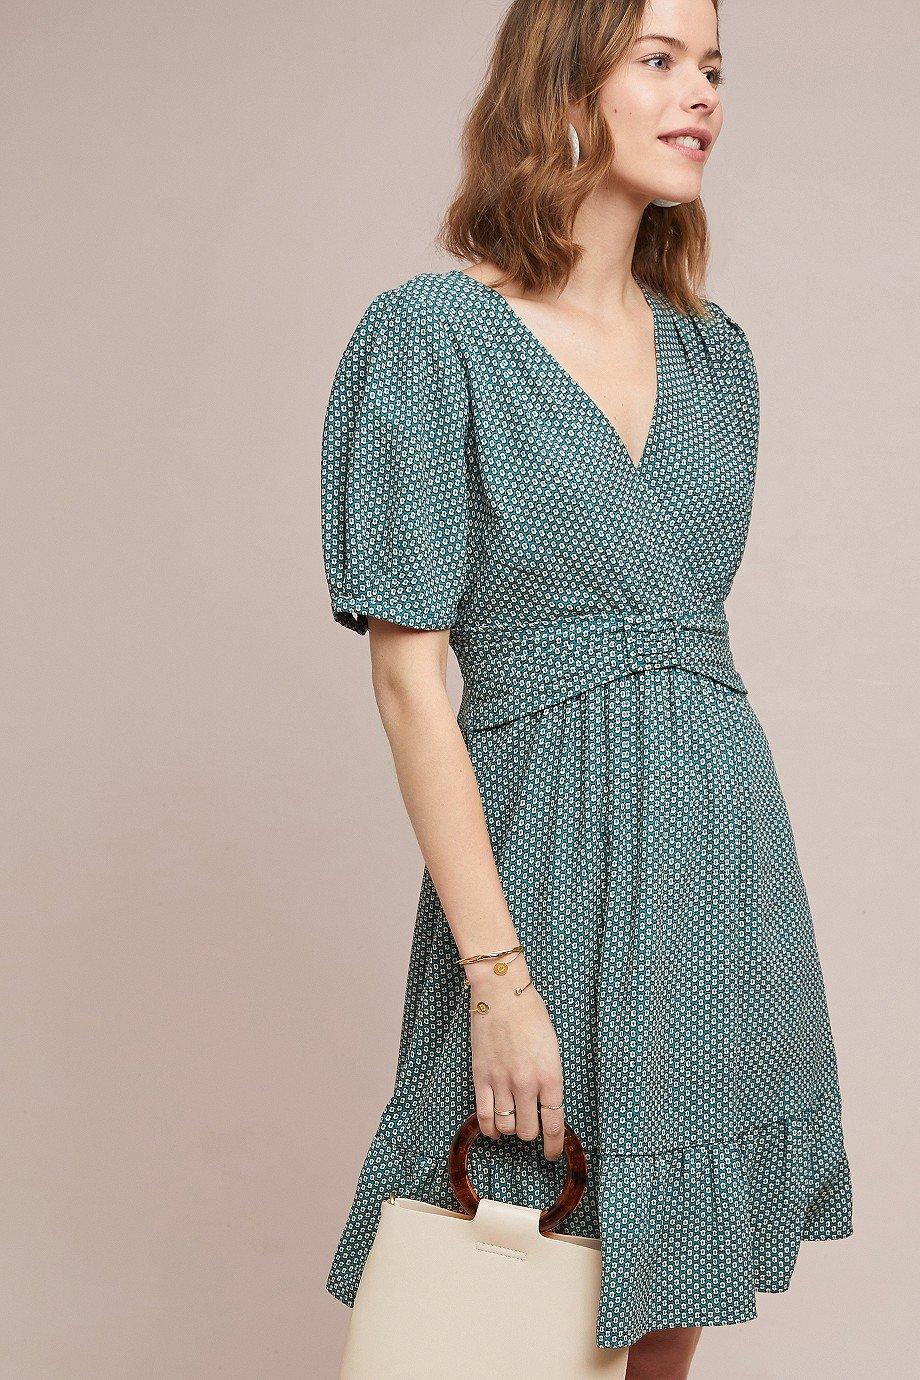 Martina Belted Dress